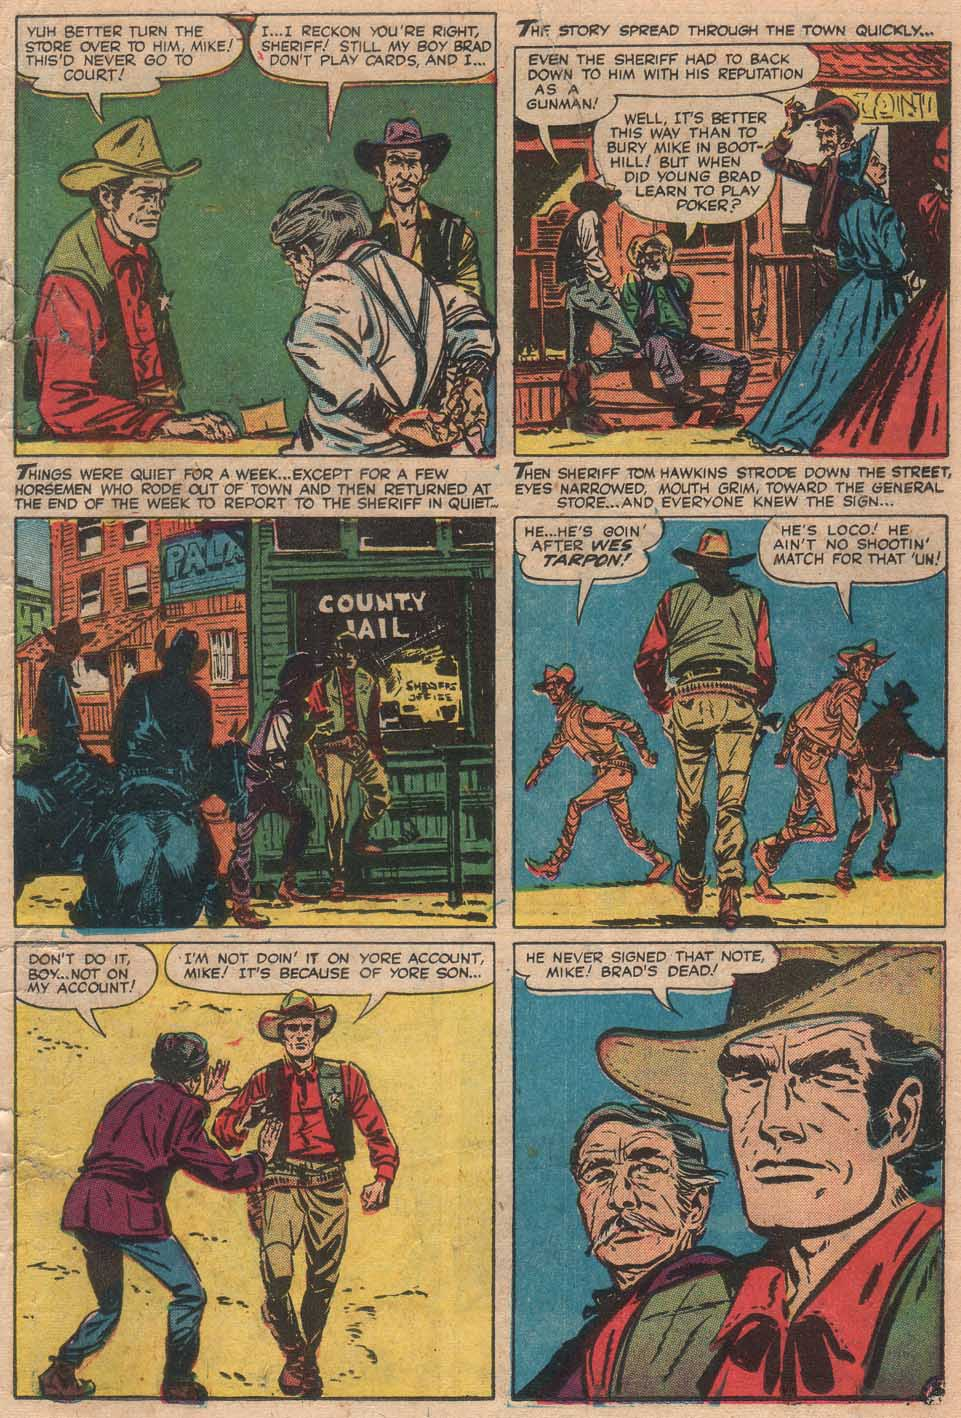 Read online Two-Gun Kid comic -  Issue #38 - 23